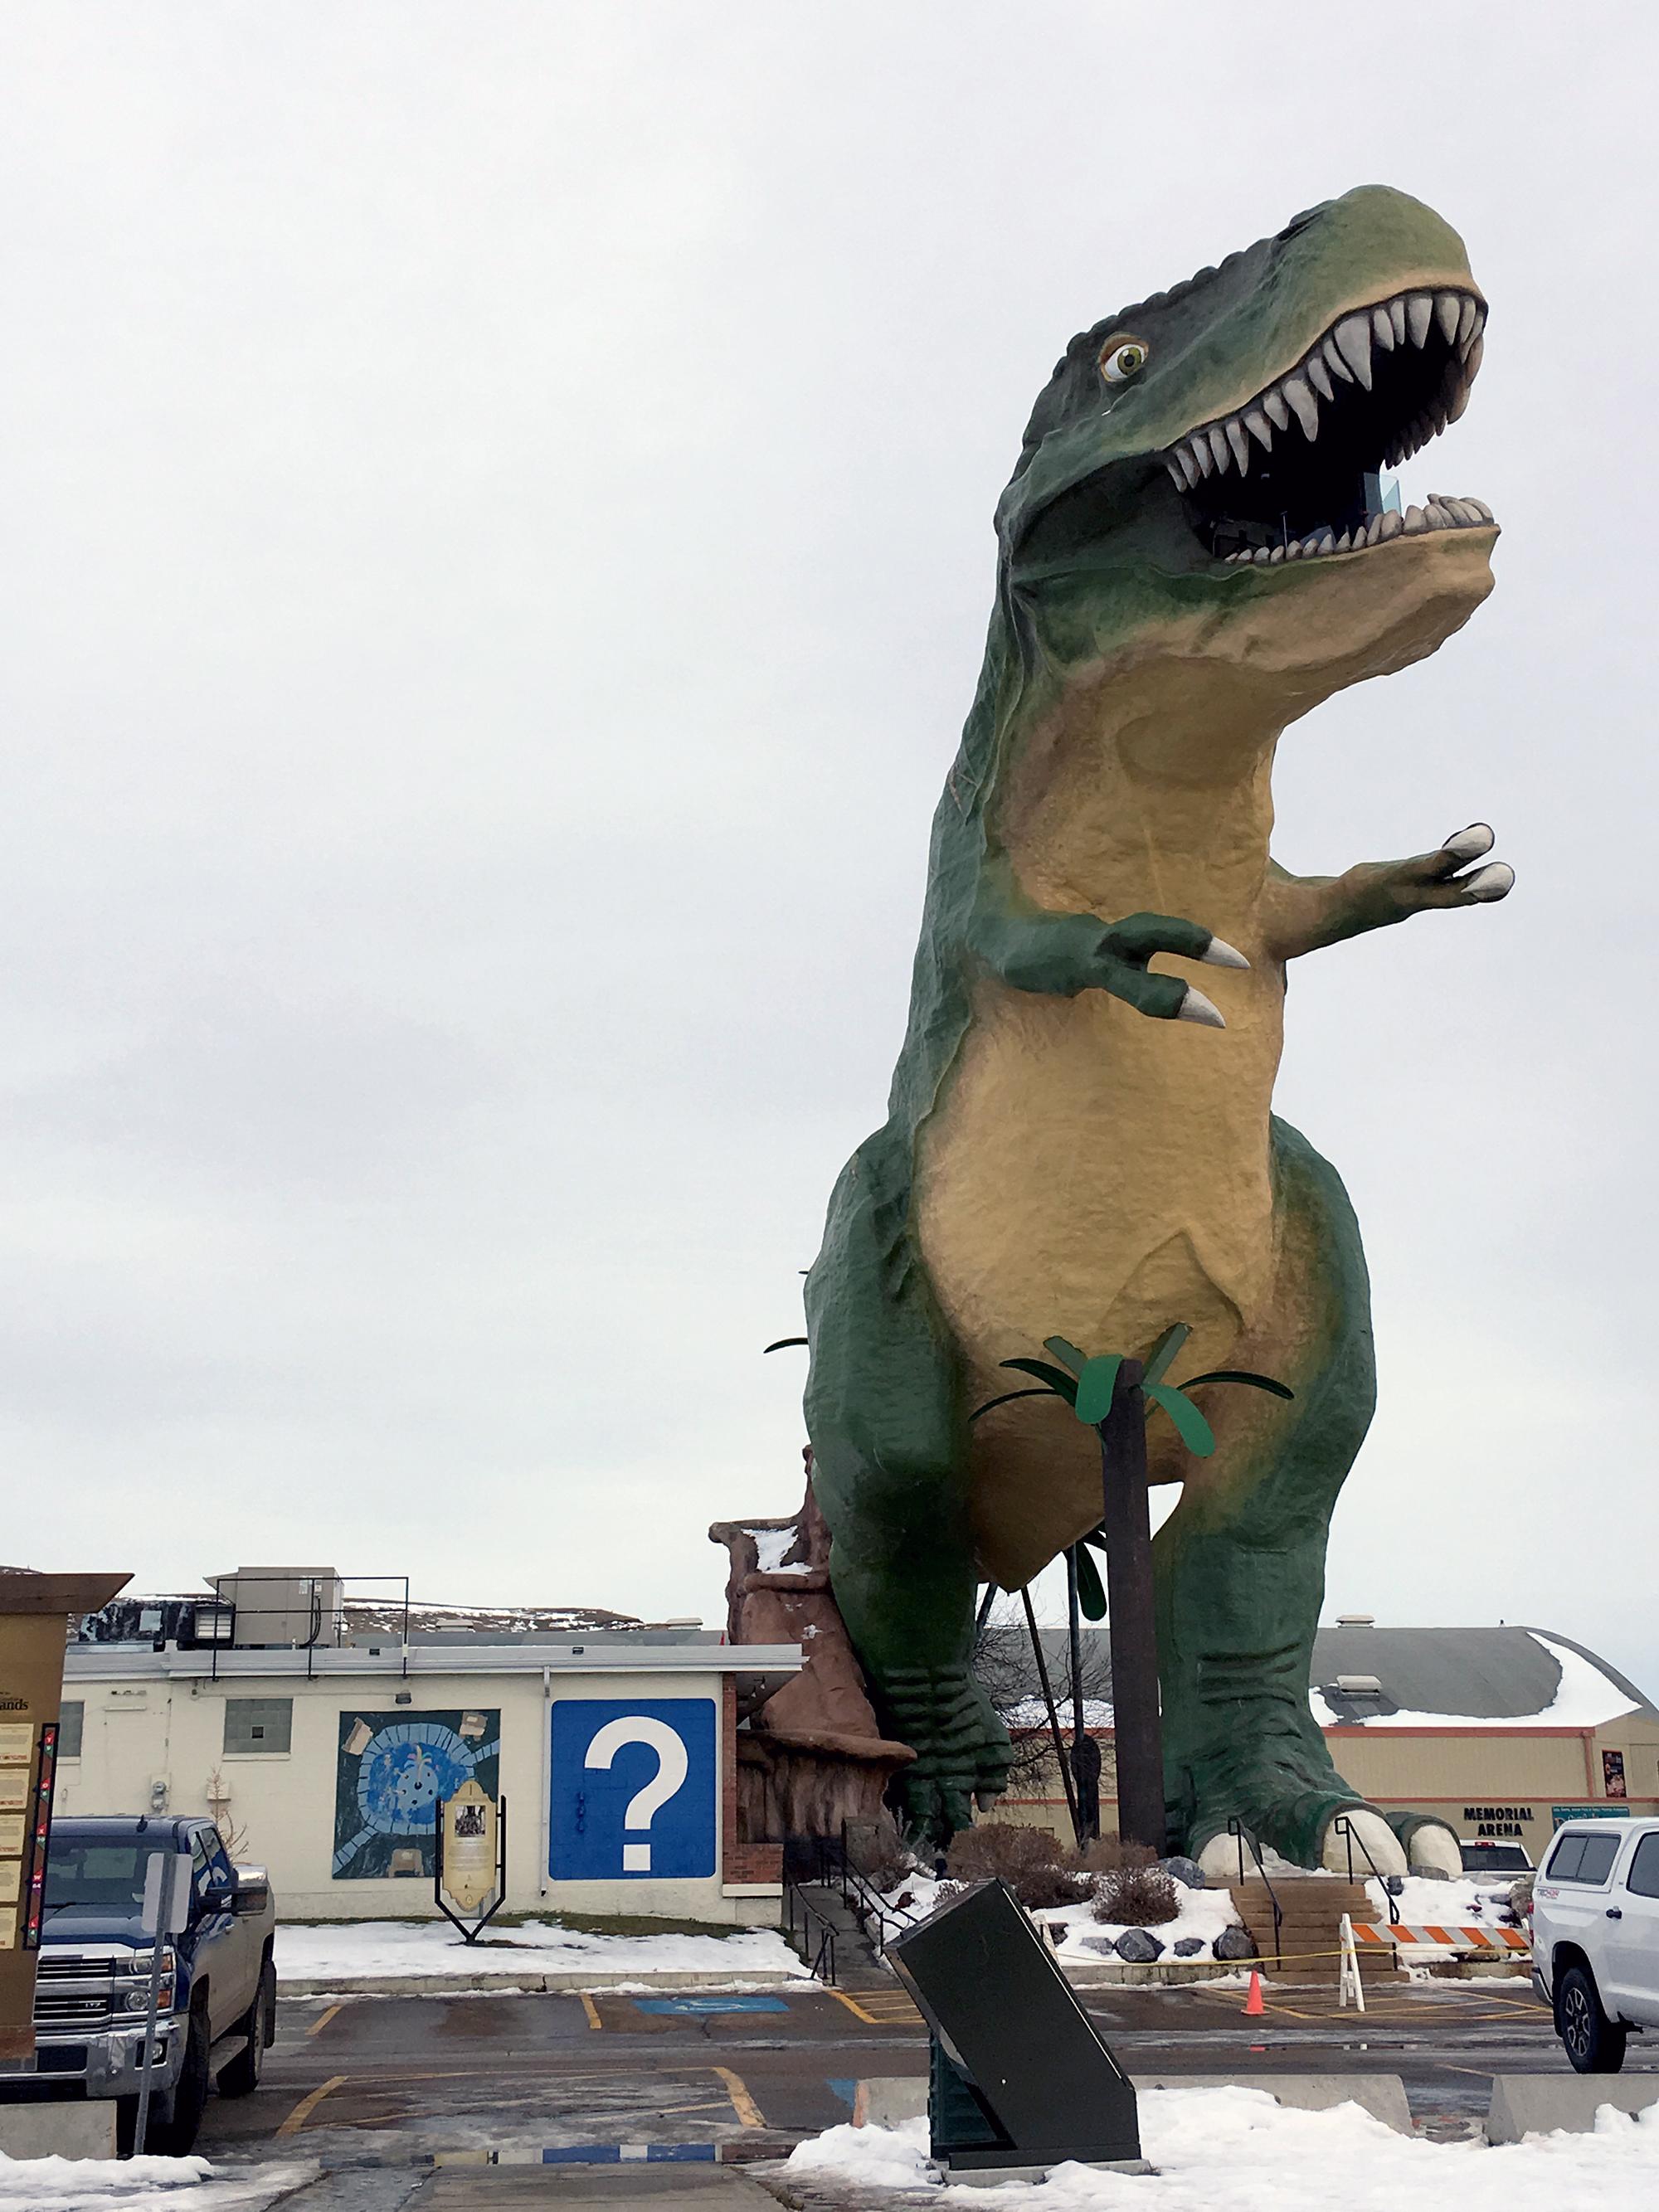 Generic Van Life - Drumheller - Worlds Largest Dinosaur